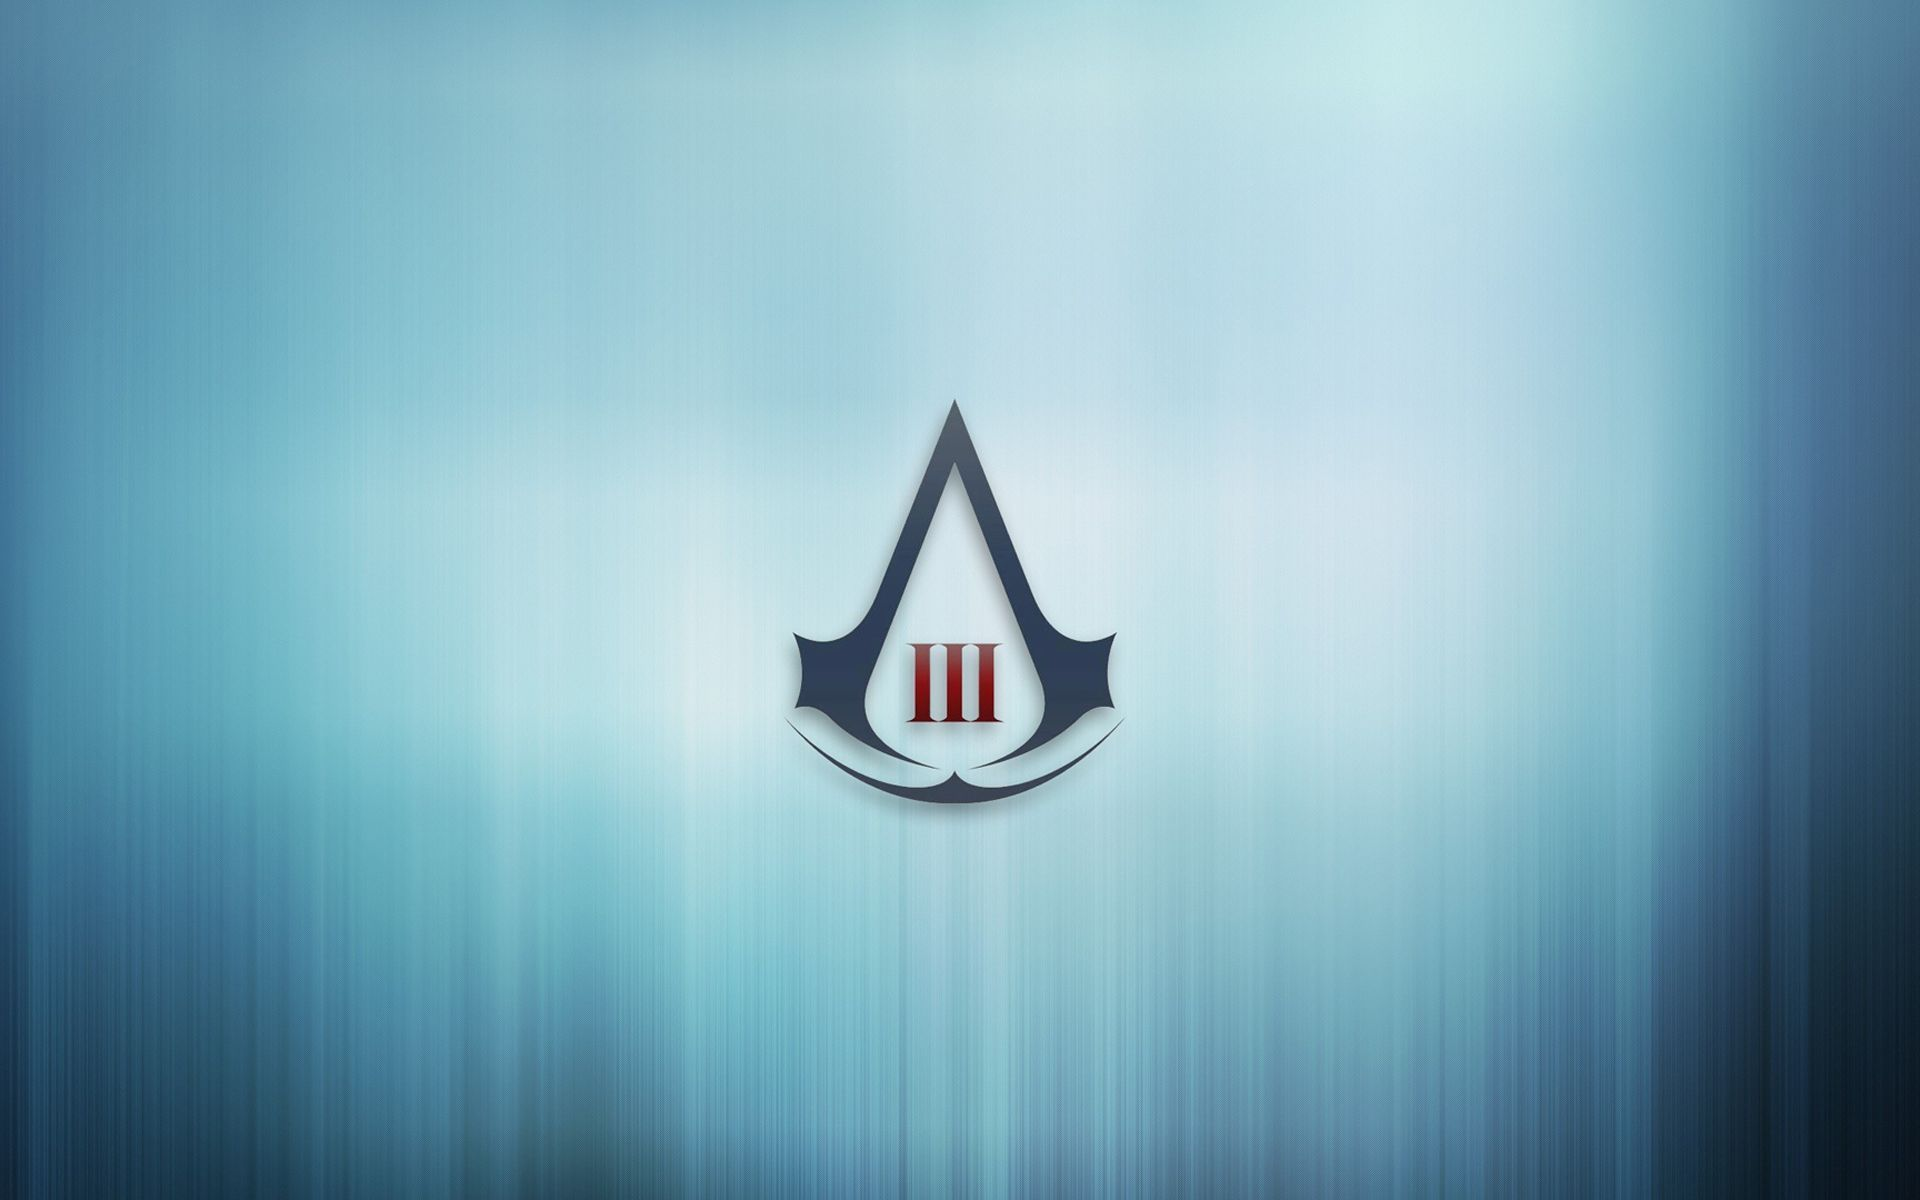 assassins creed logo wallpaper 40842 1920x1200 px